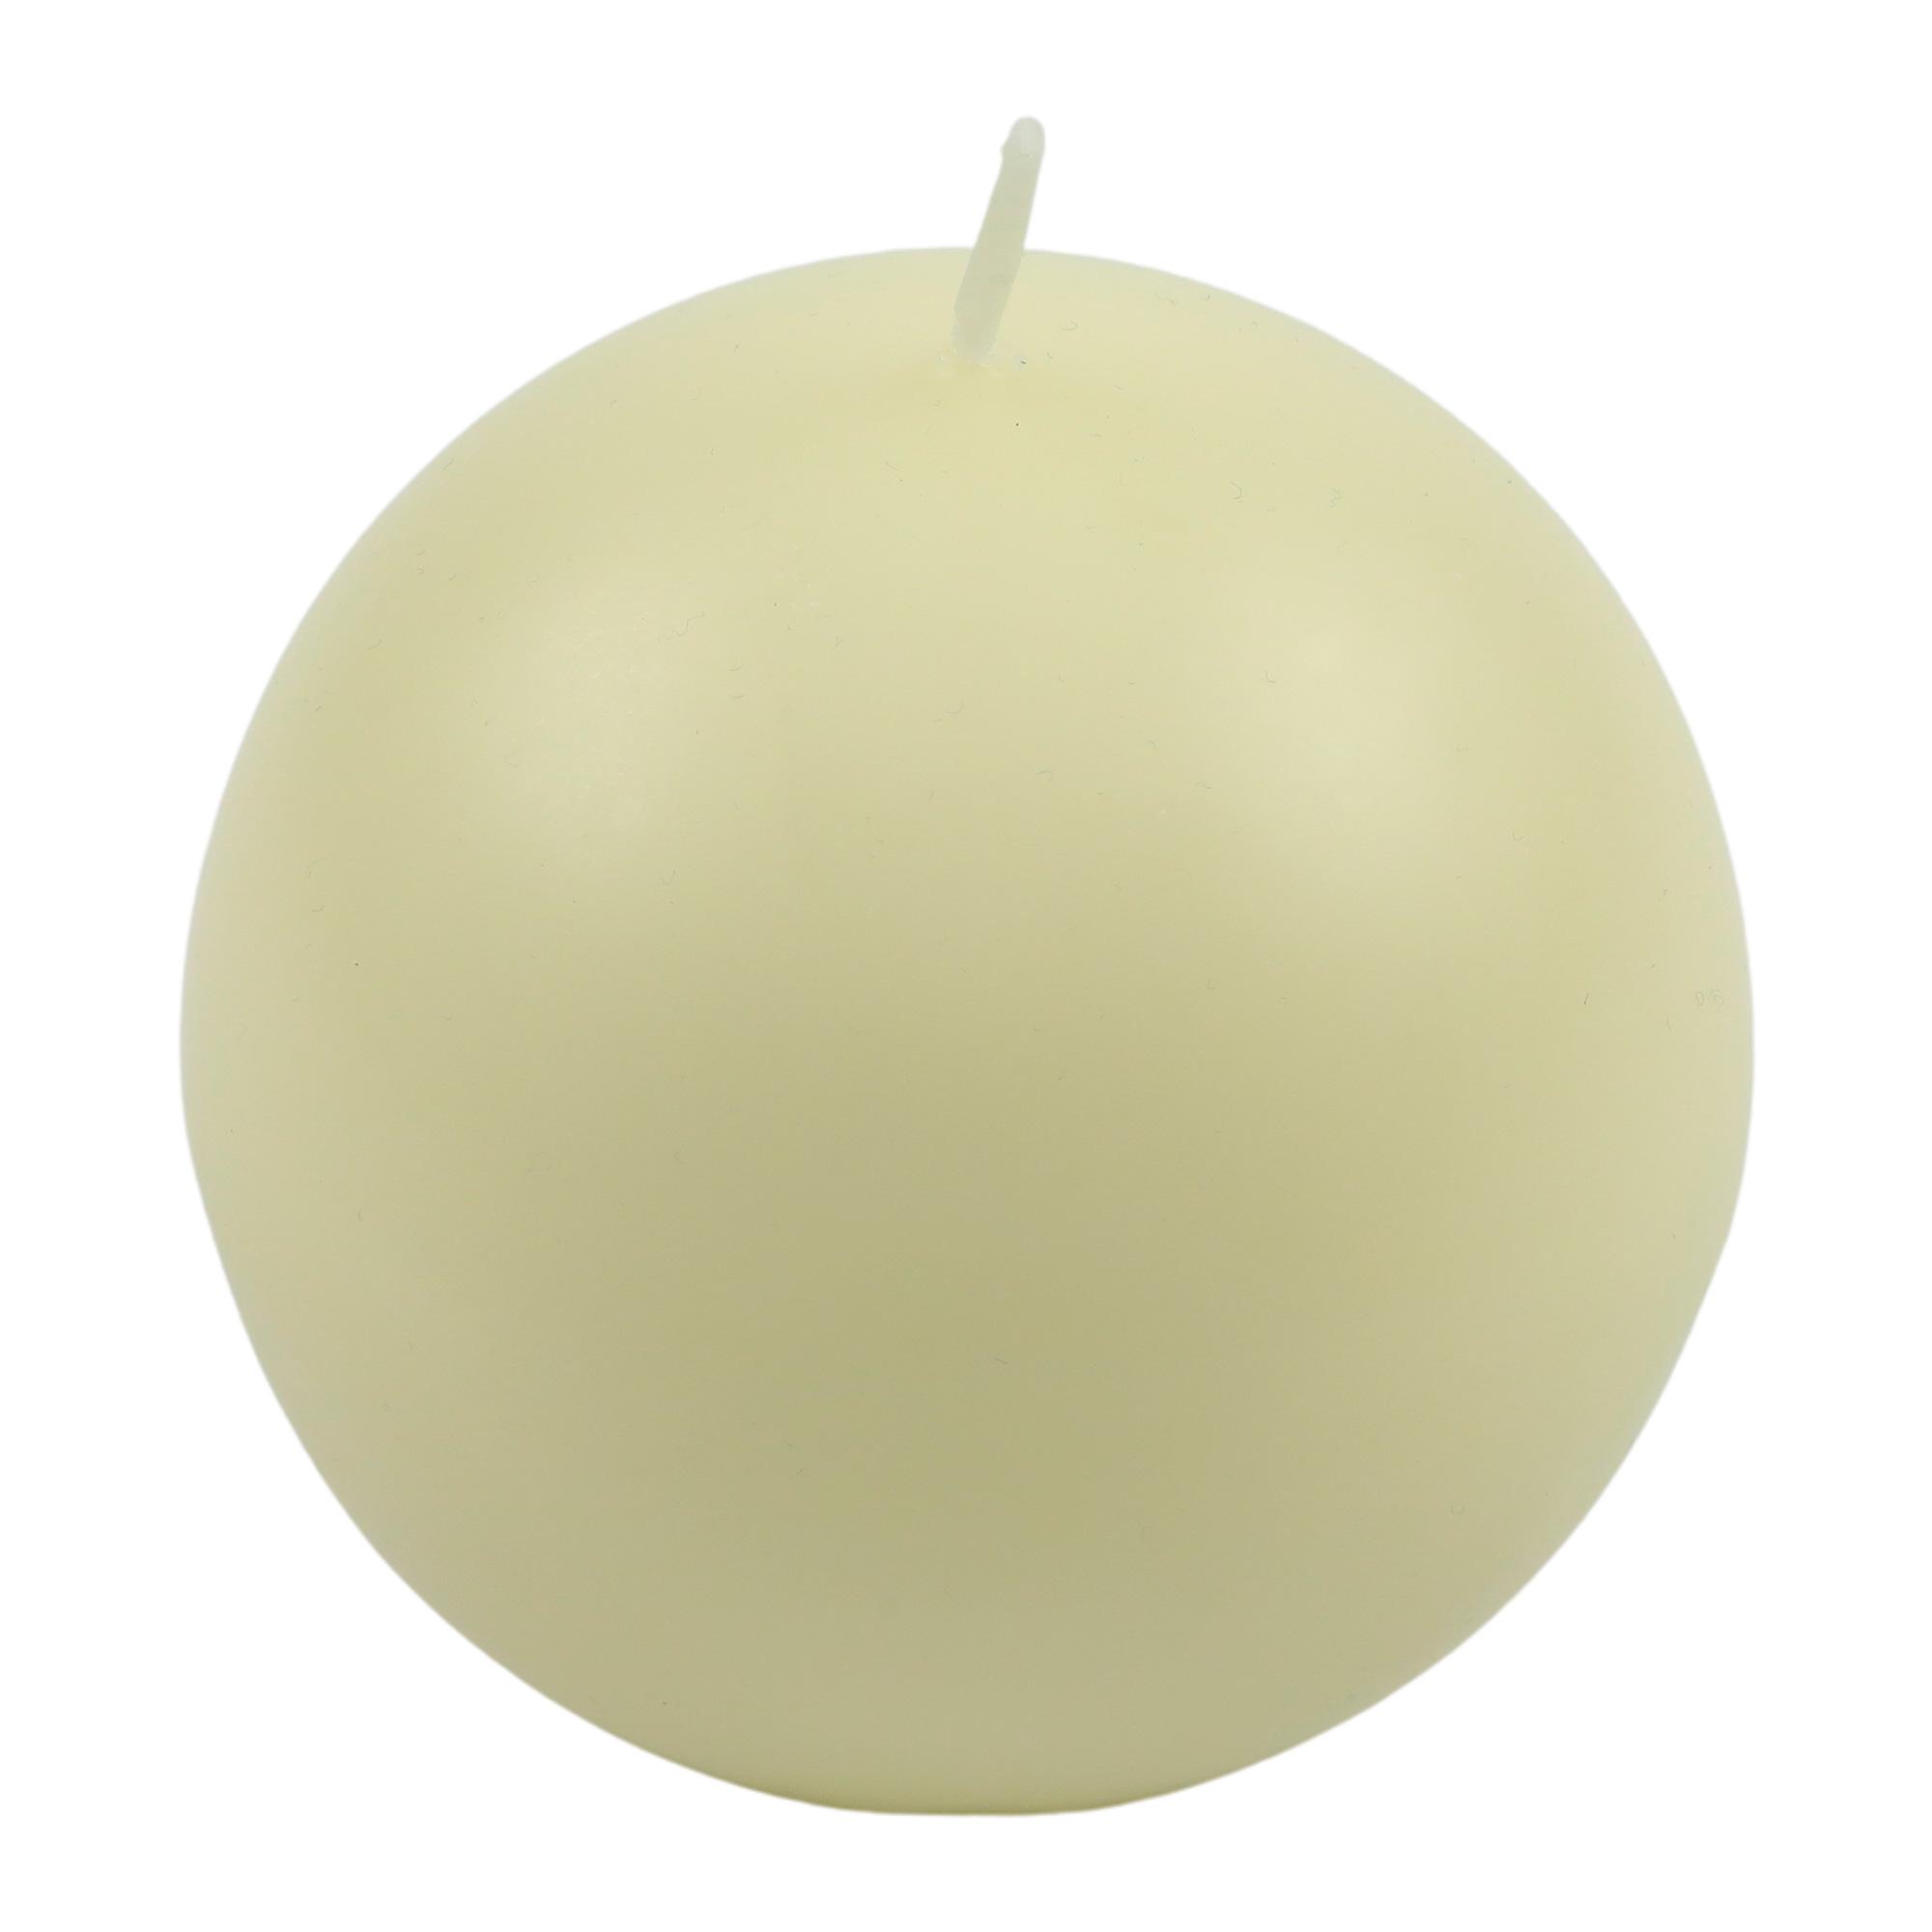 "Vela ""Bola"" 10 Cm de diâmetro"